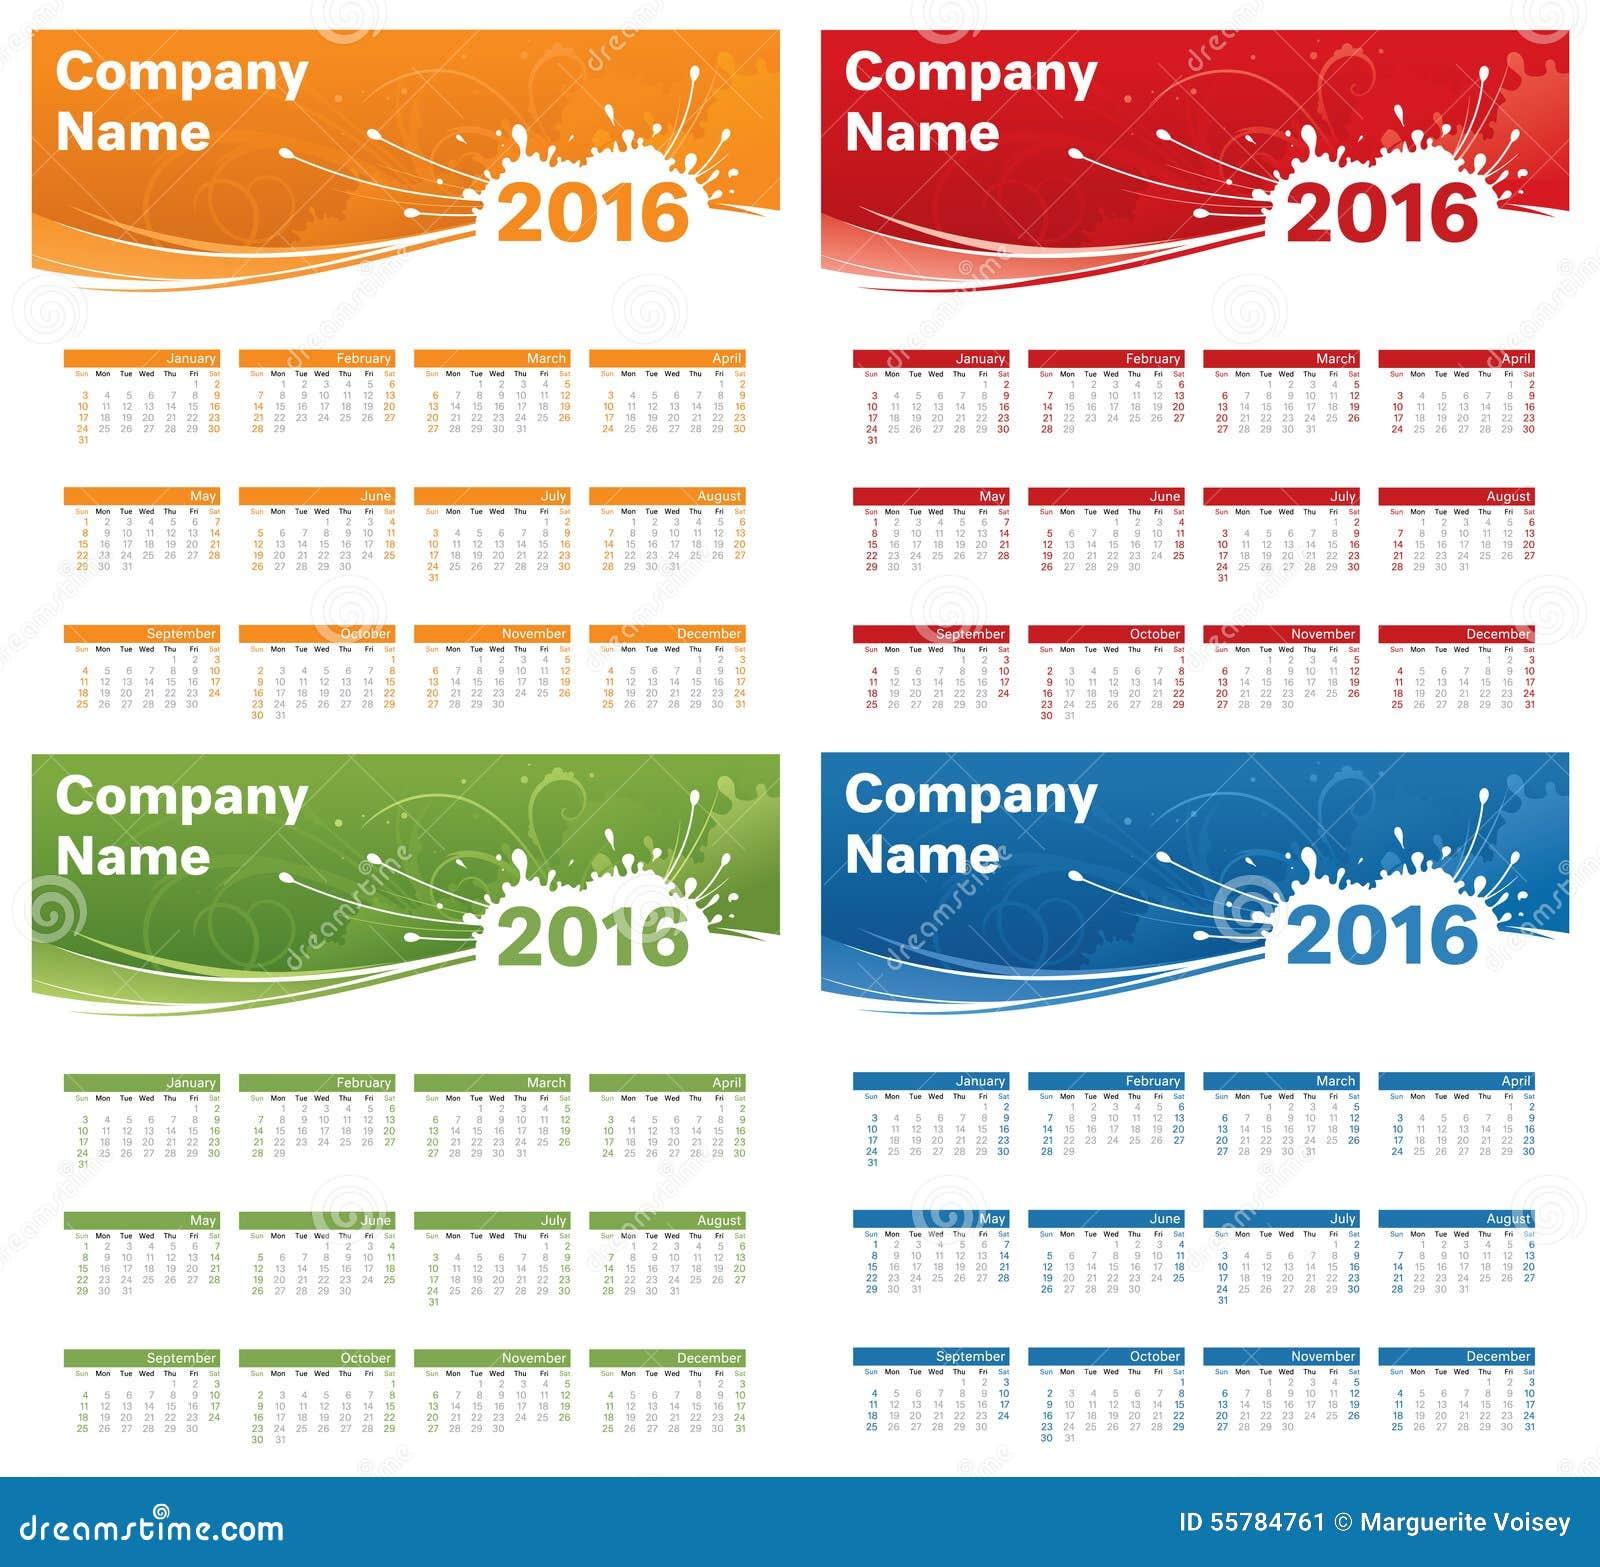 Calendar Logo : Year calendar logo space stock illustration image